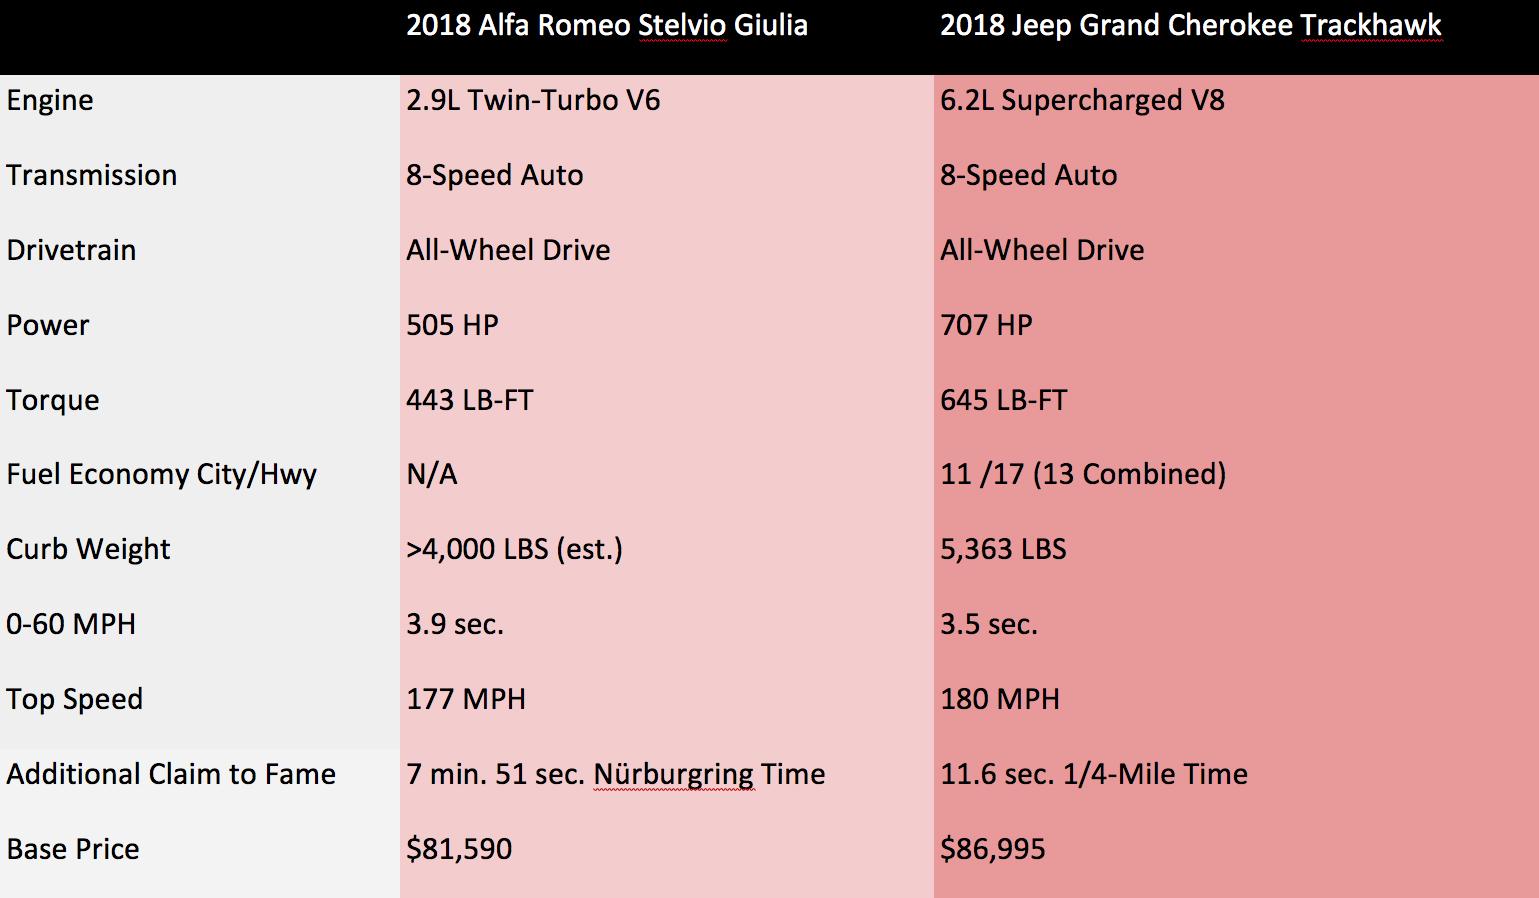 Suv Comparison Spreadsheet Inside 2018 Alfa Romeo Stelvio Quadrifoglio Vs. 2018 Jeep Grand Cherokee